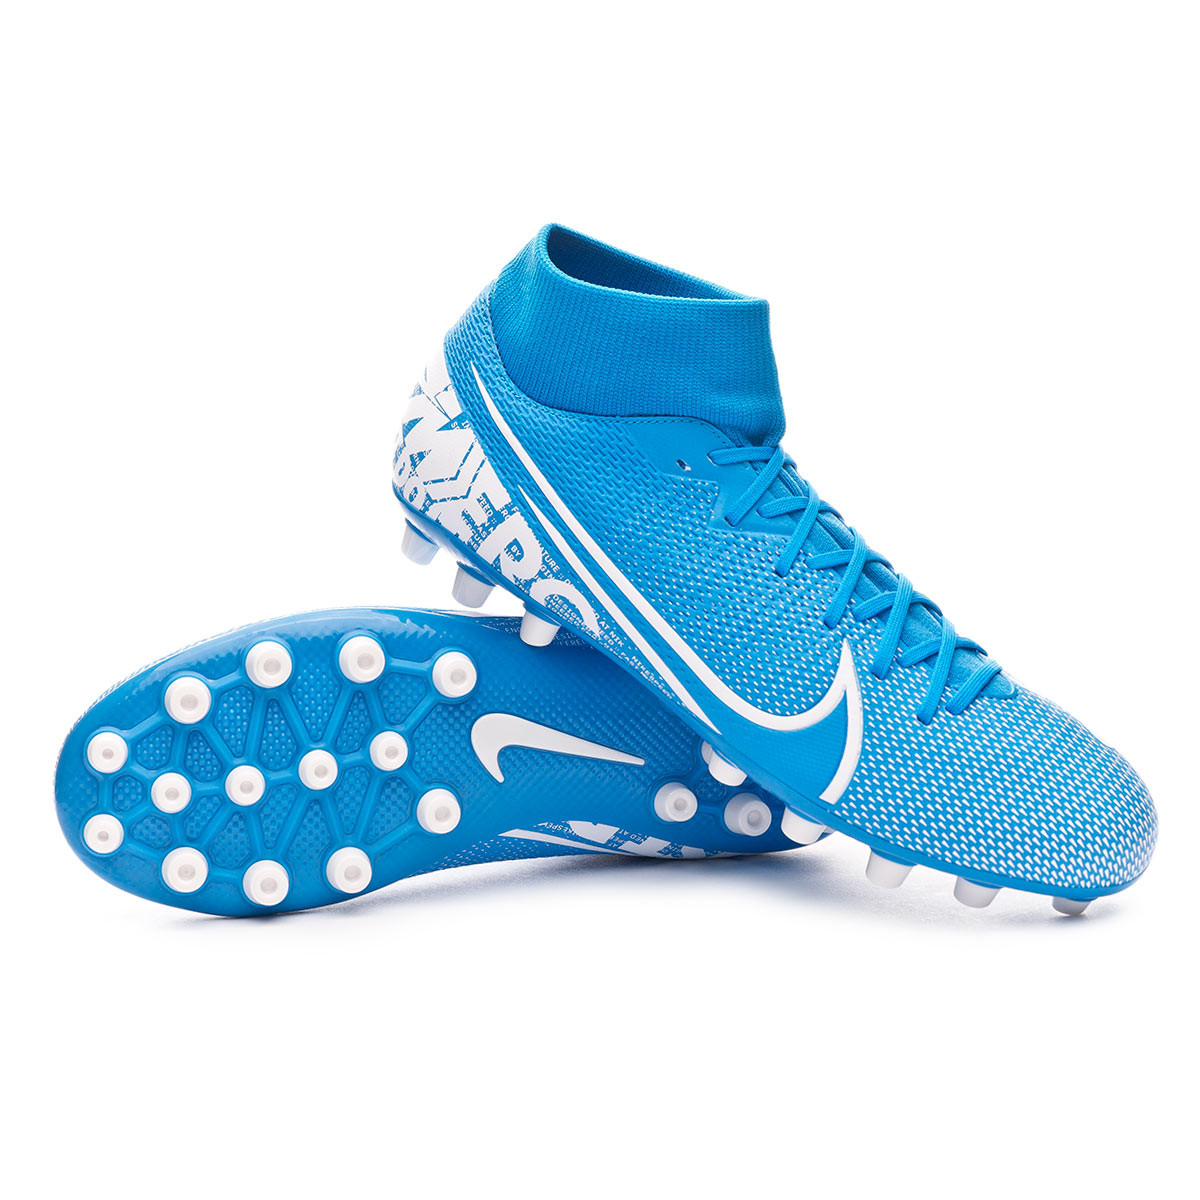 Nike Mercurial Superfly Academy Loja de futebol Fútbol Emotion